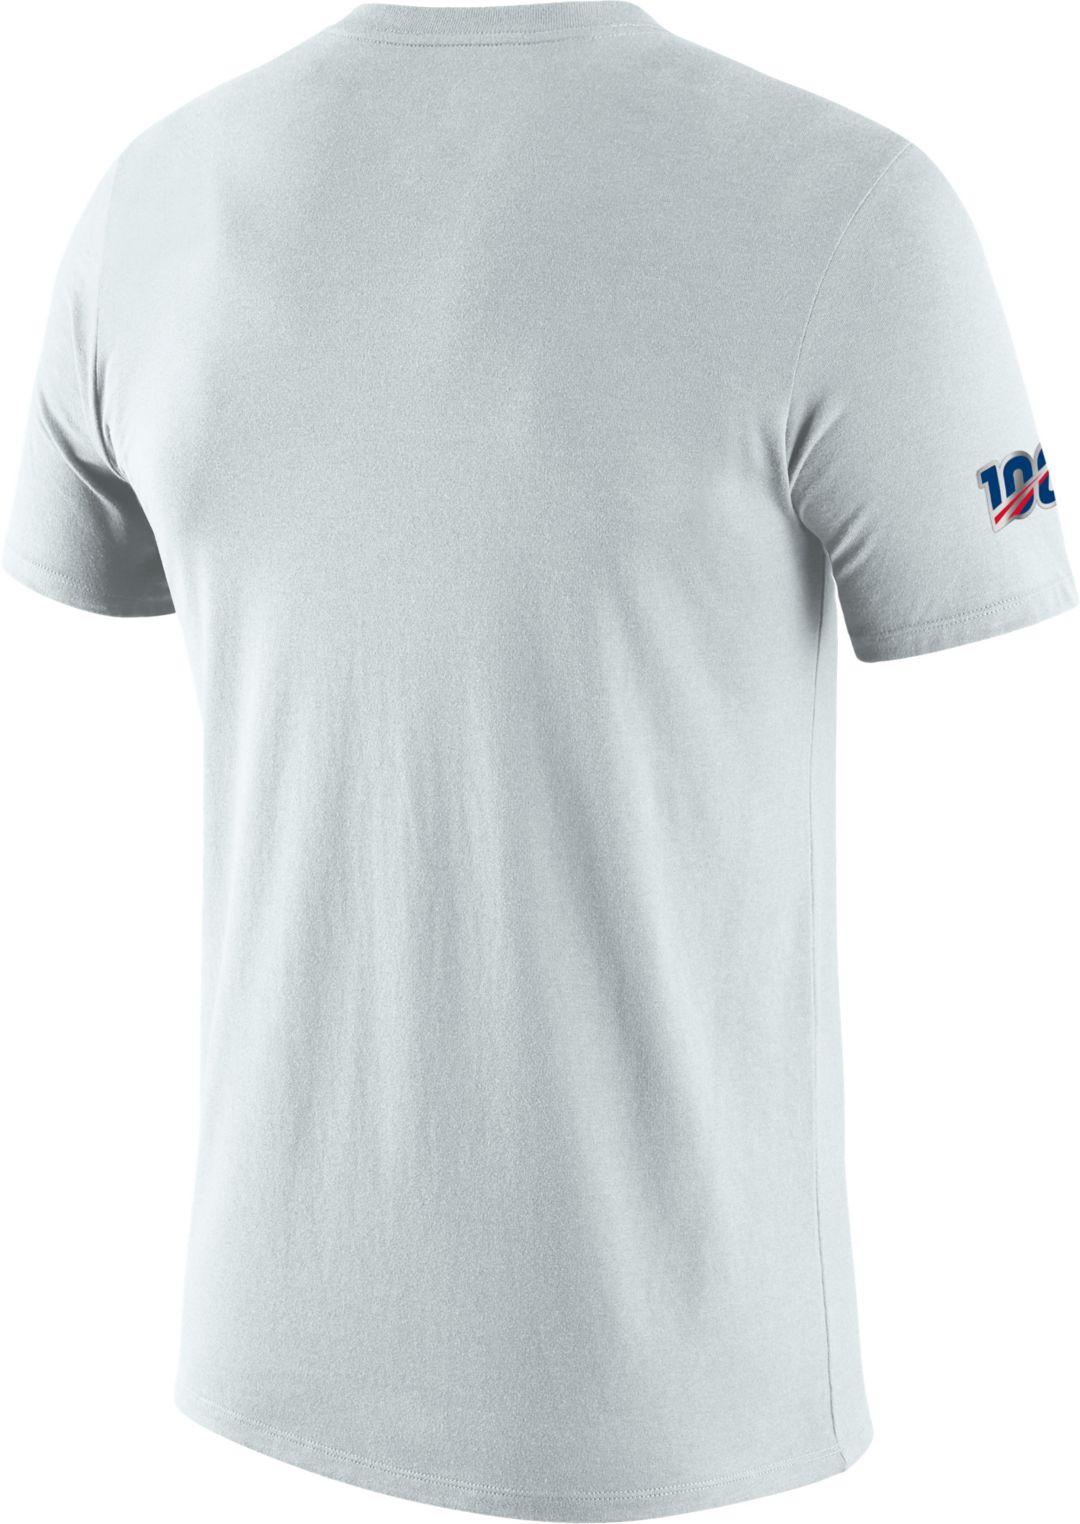 sale retailer ff046 aa944 Nike Men's New Orleans Saints 100th Sideline Legend Performance White  T-Shirt